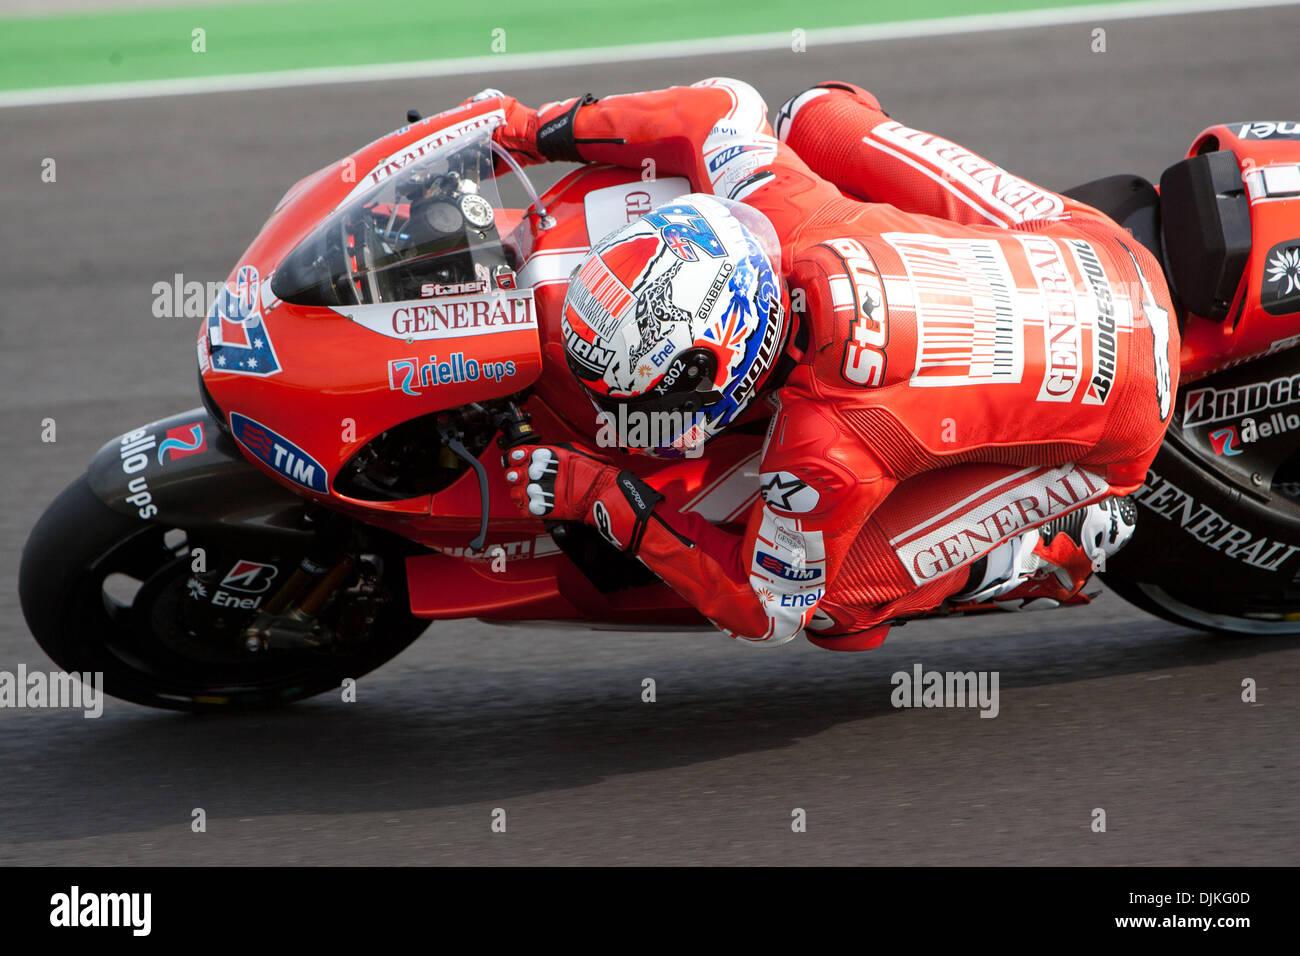 Sep. 05, 2010 - Misano Adriatico, Italy - Ducati rider Casey Stoner (AUS 27)  during the San Marino GP in Misano Adriatico, Italy. (Credit Image: © Andrea Ranalli/Southcreek Global/ZUMApress.com) - Stock Image